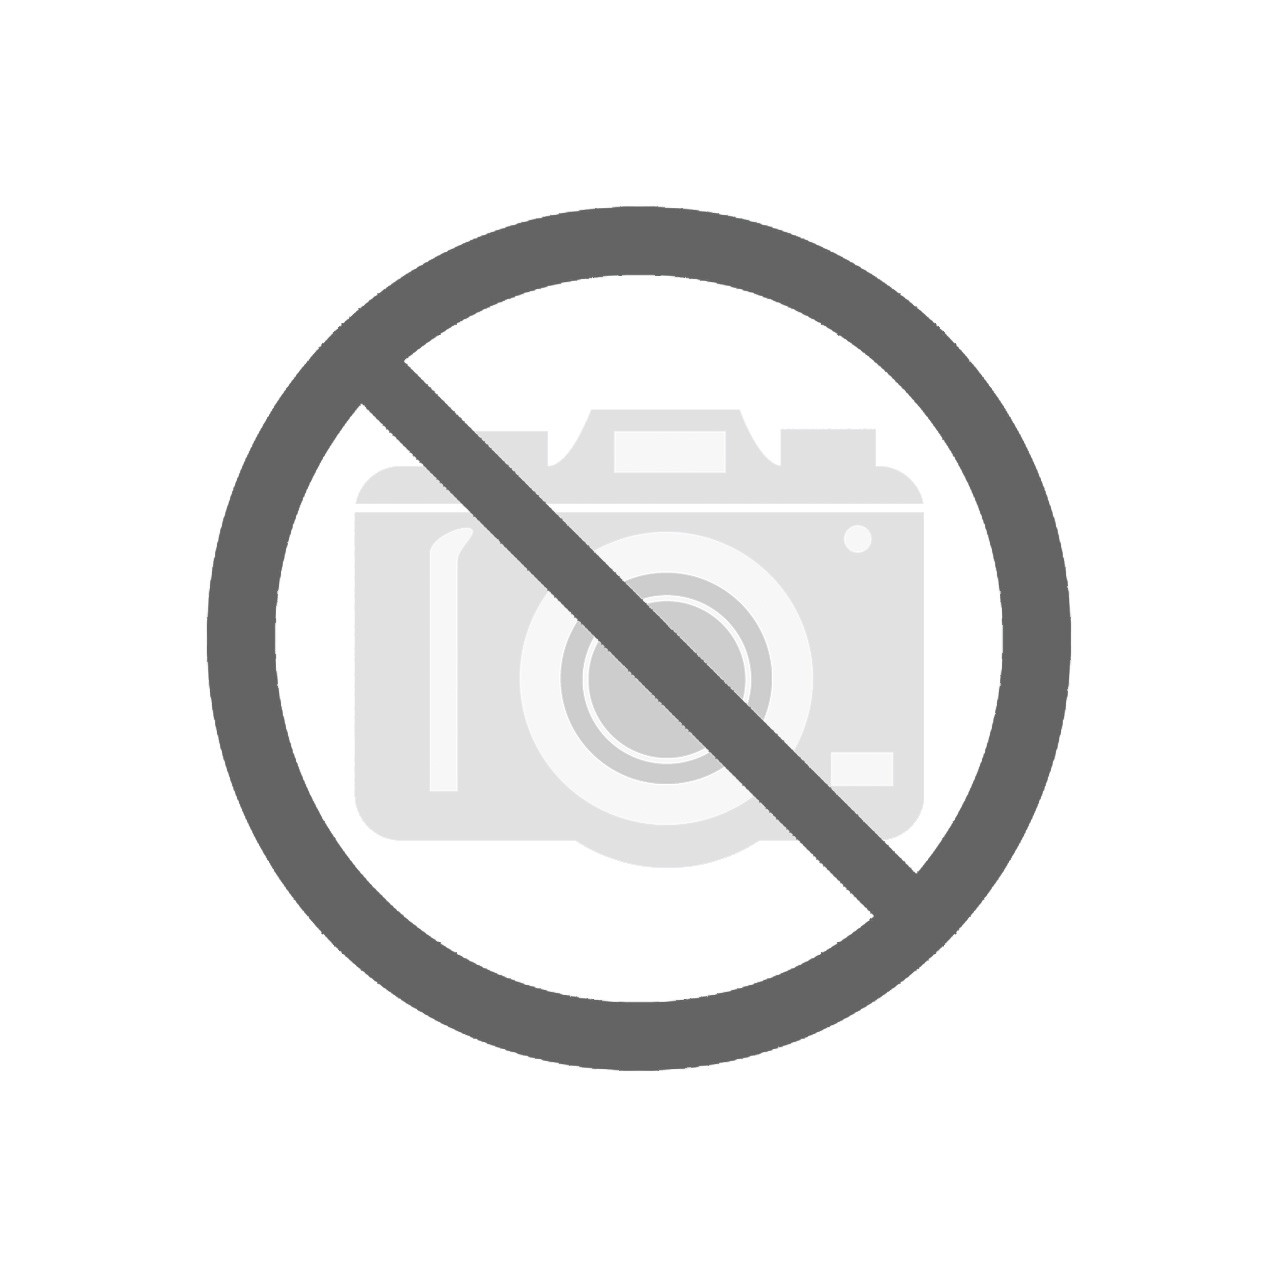 Transporter wiórów do MSB 460 V BERNARDO